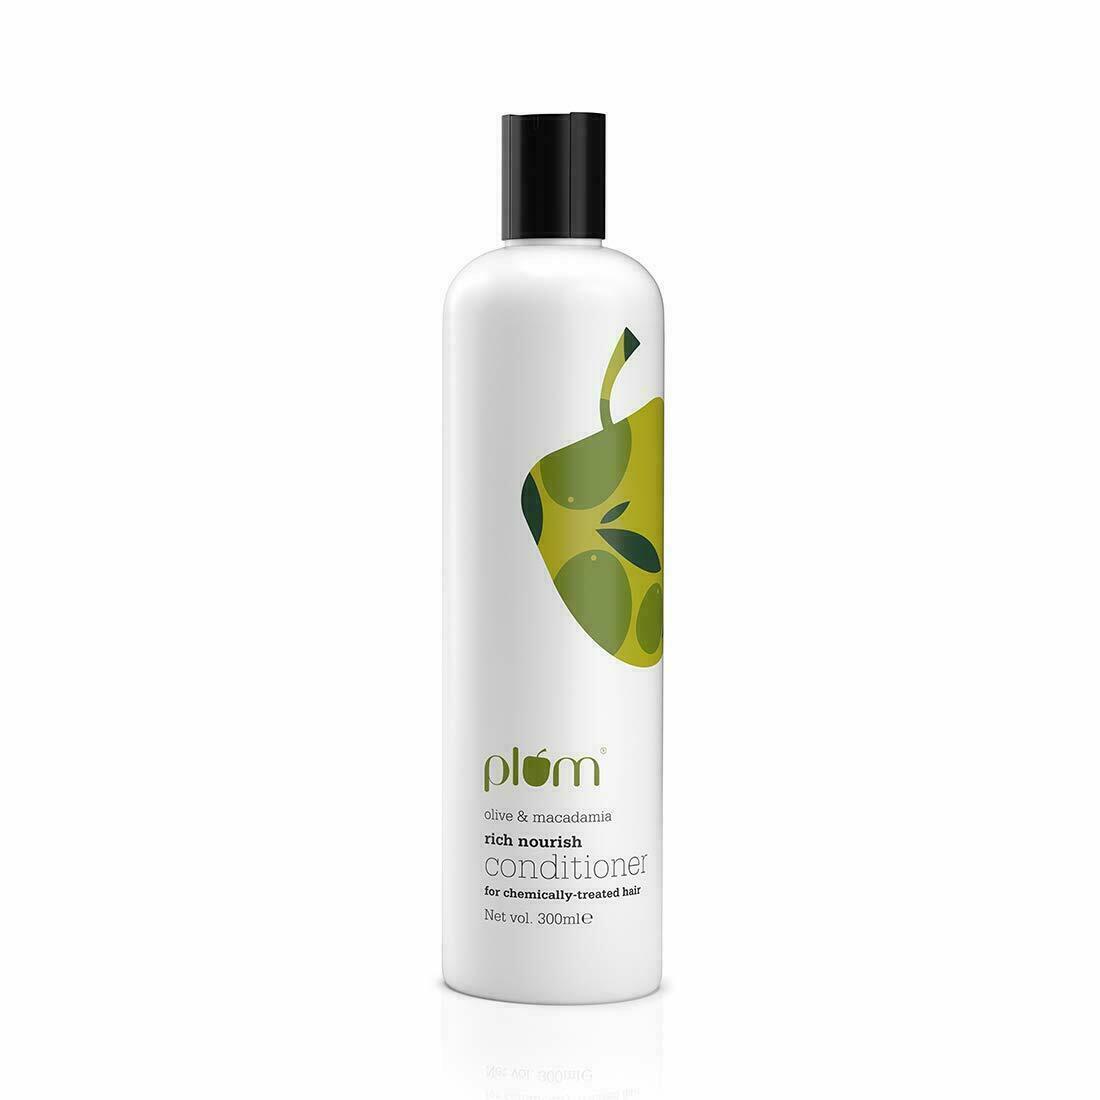 Plum Olive & Macadamia Rich Nourish Conditioner Green 300 ml